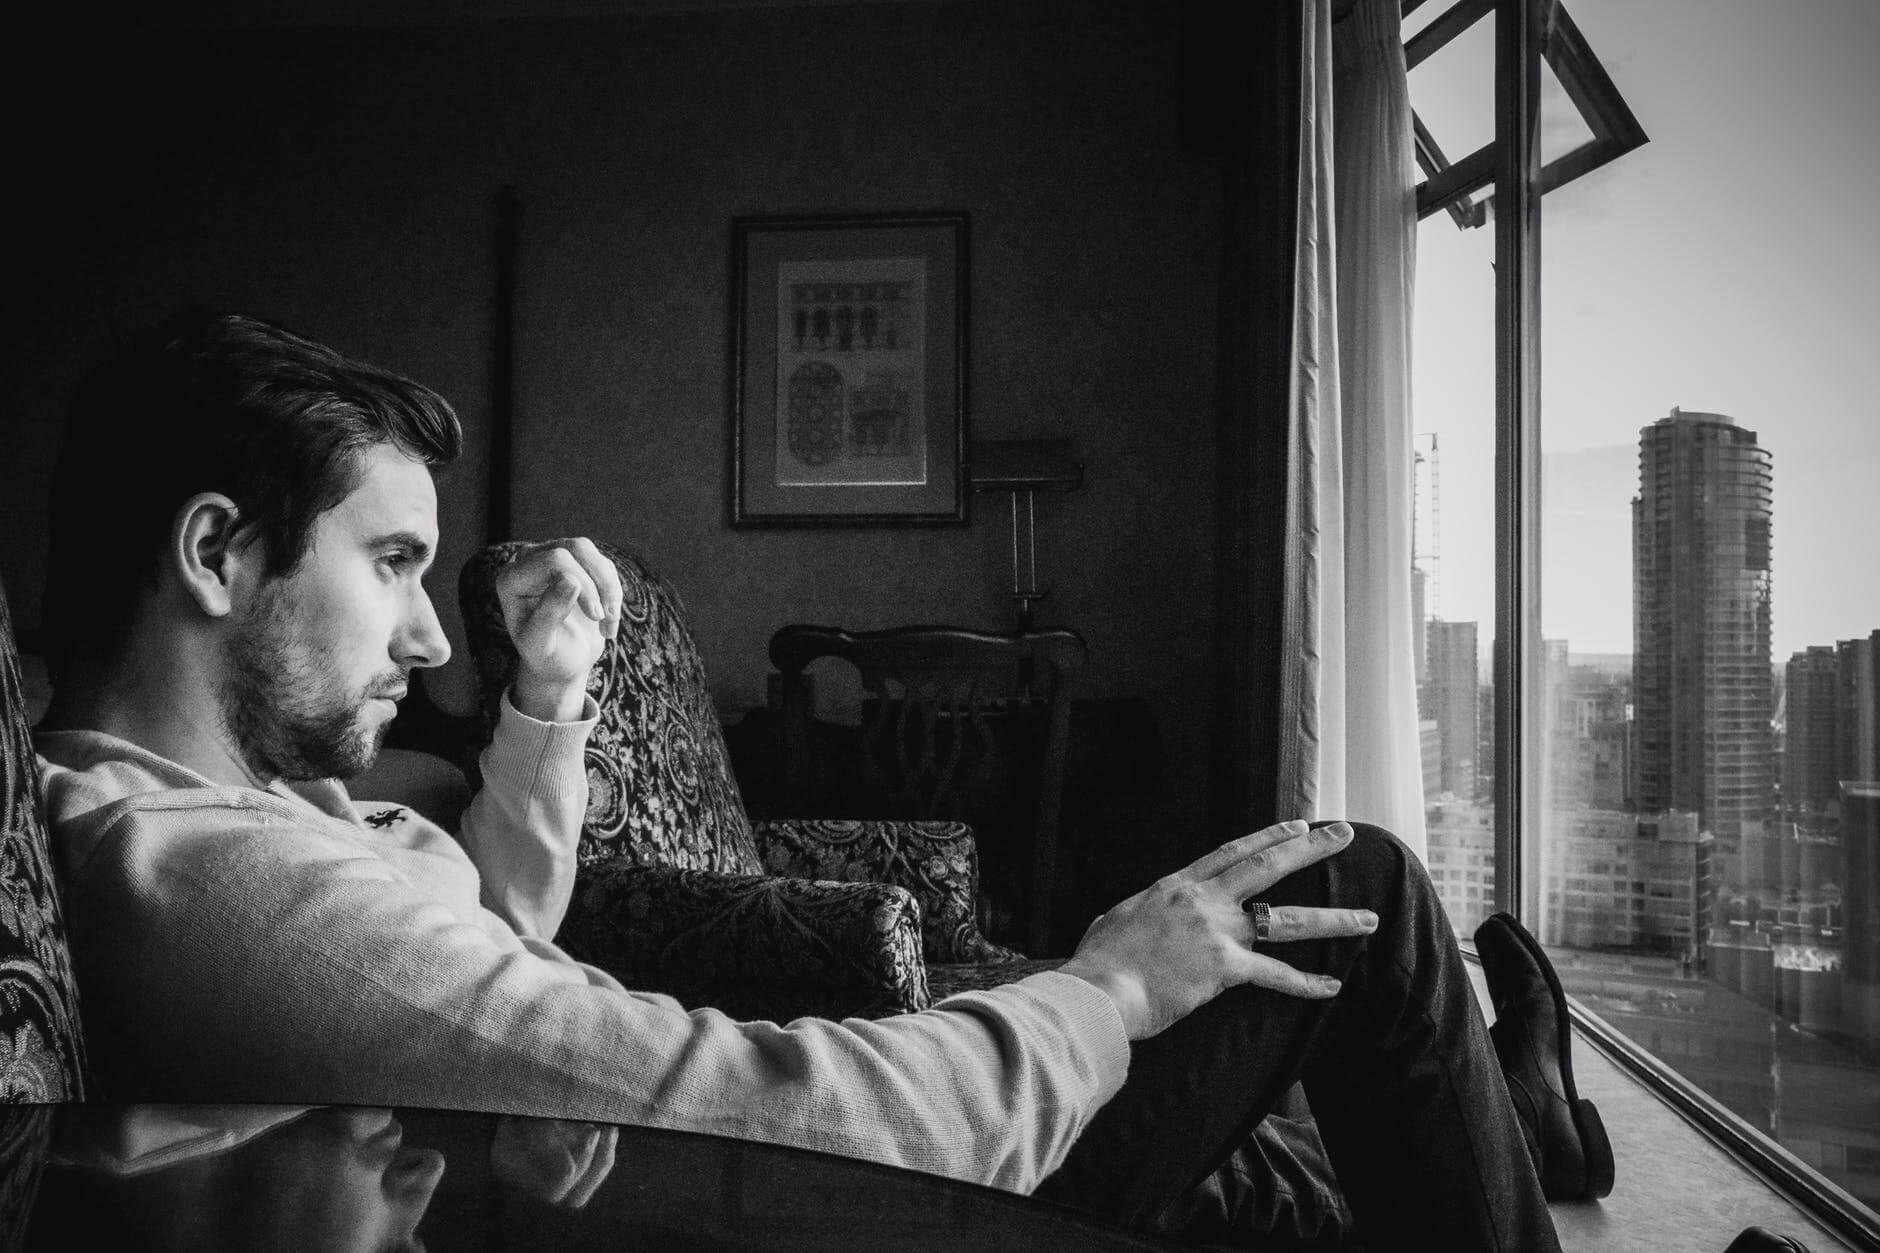 hombre ante ventana representando el narcisismo maligno